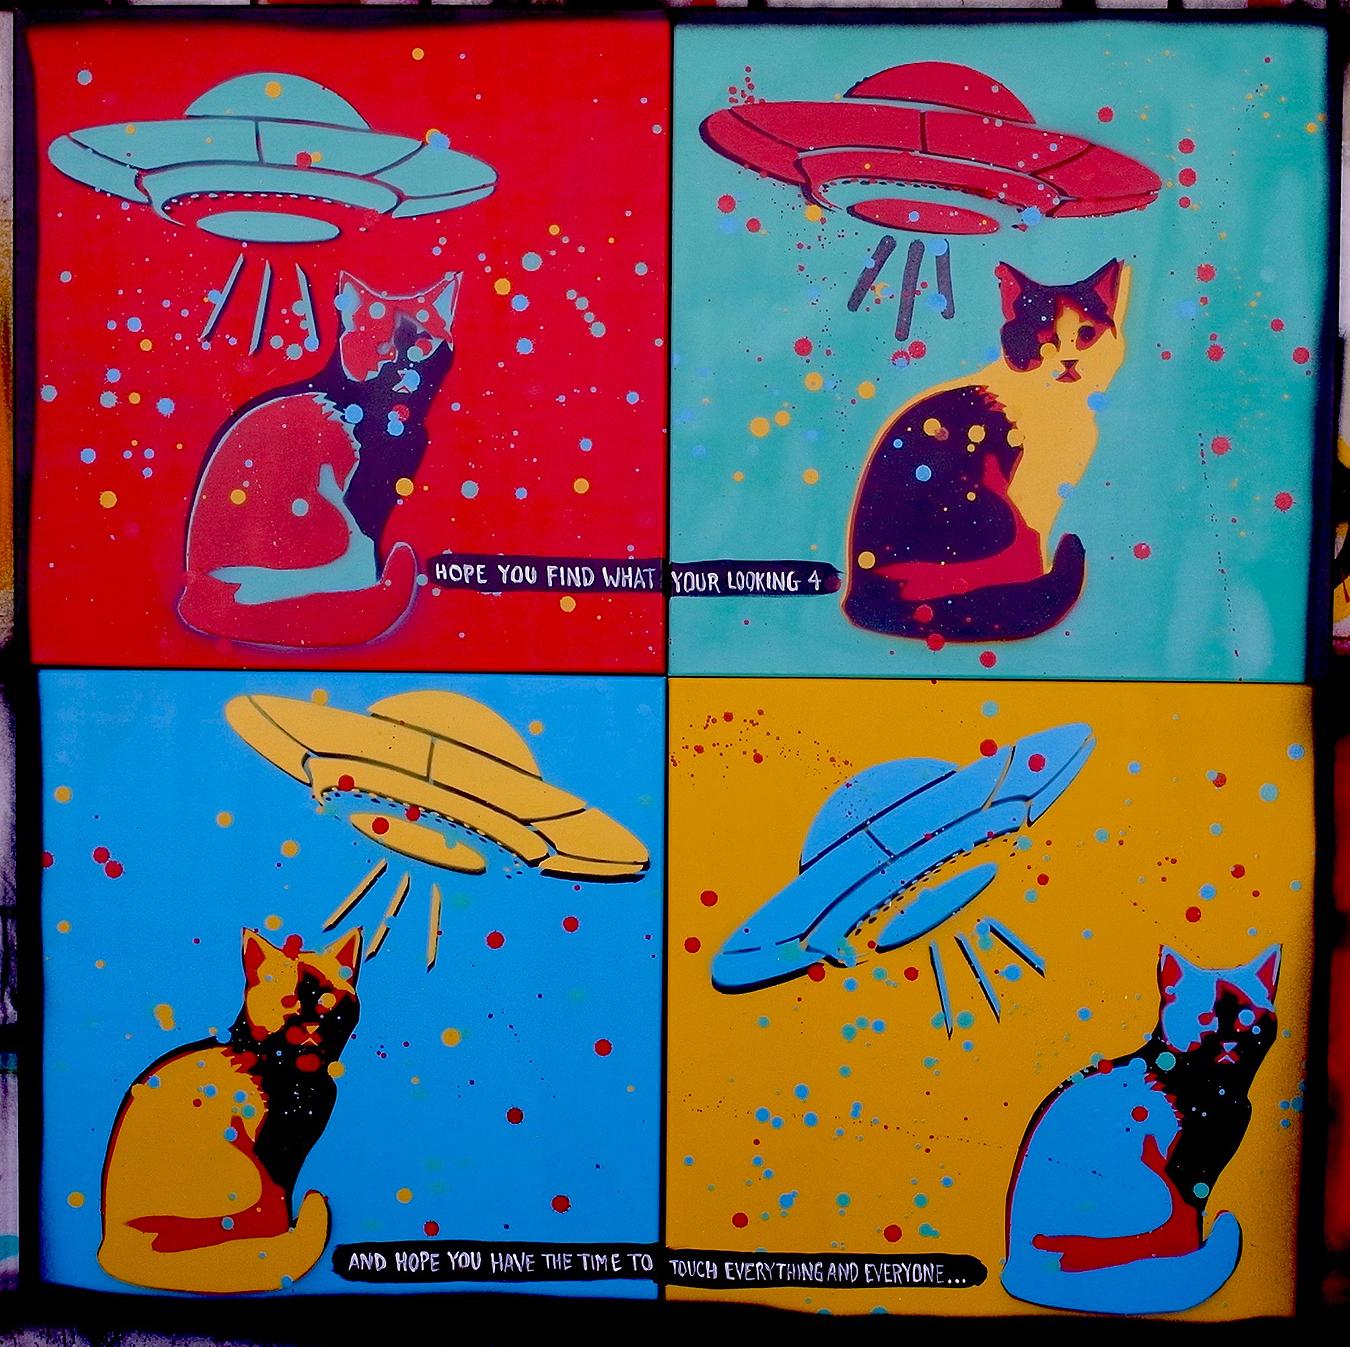 Tony_Ward_Studio_affiliate_artist_Dean_Rosenzweig_pop_ODXT_art_logo_hope_flying_saucers_graphics_cats_Bob_Shell